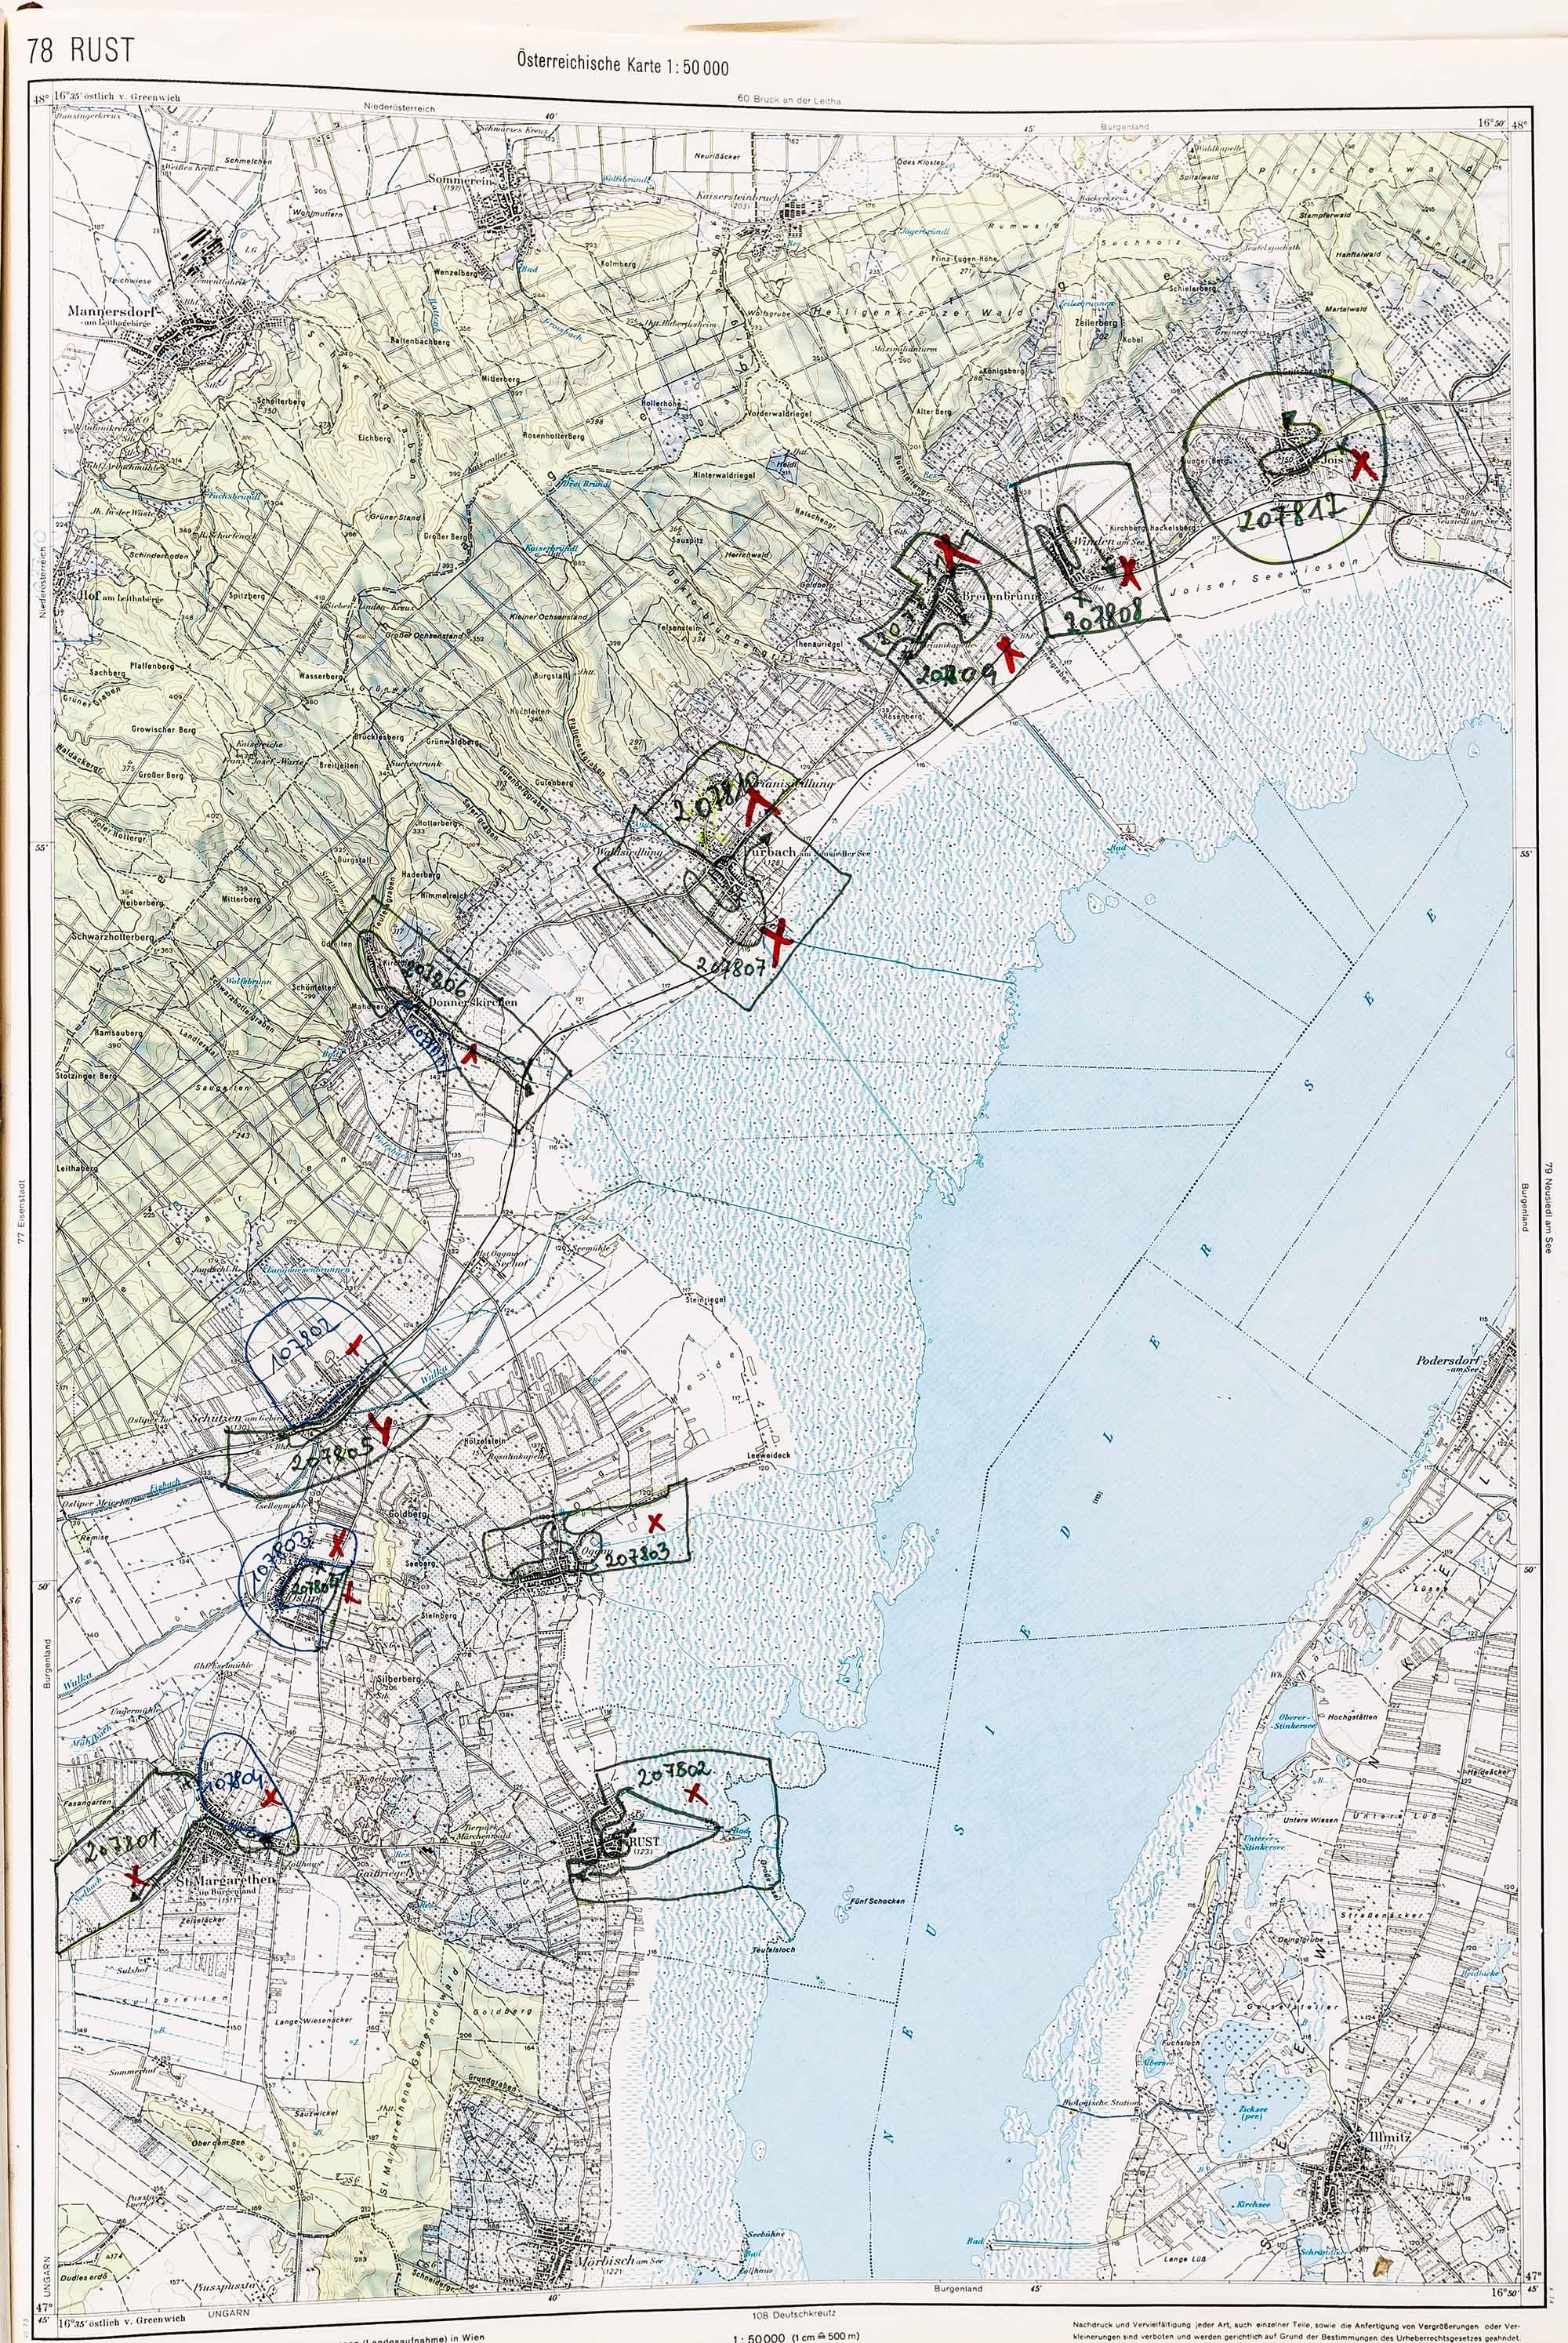 1979-1982 Karte 078